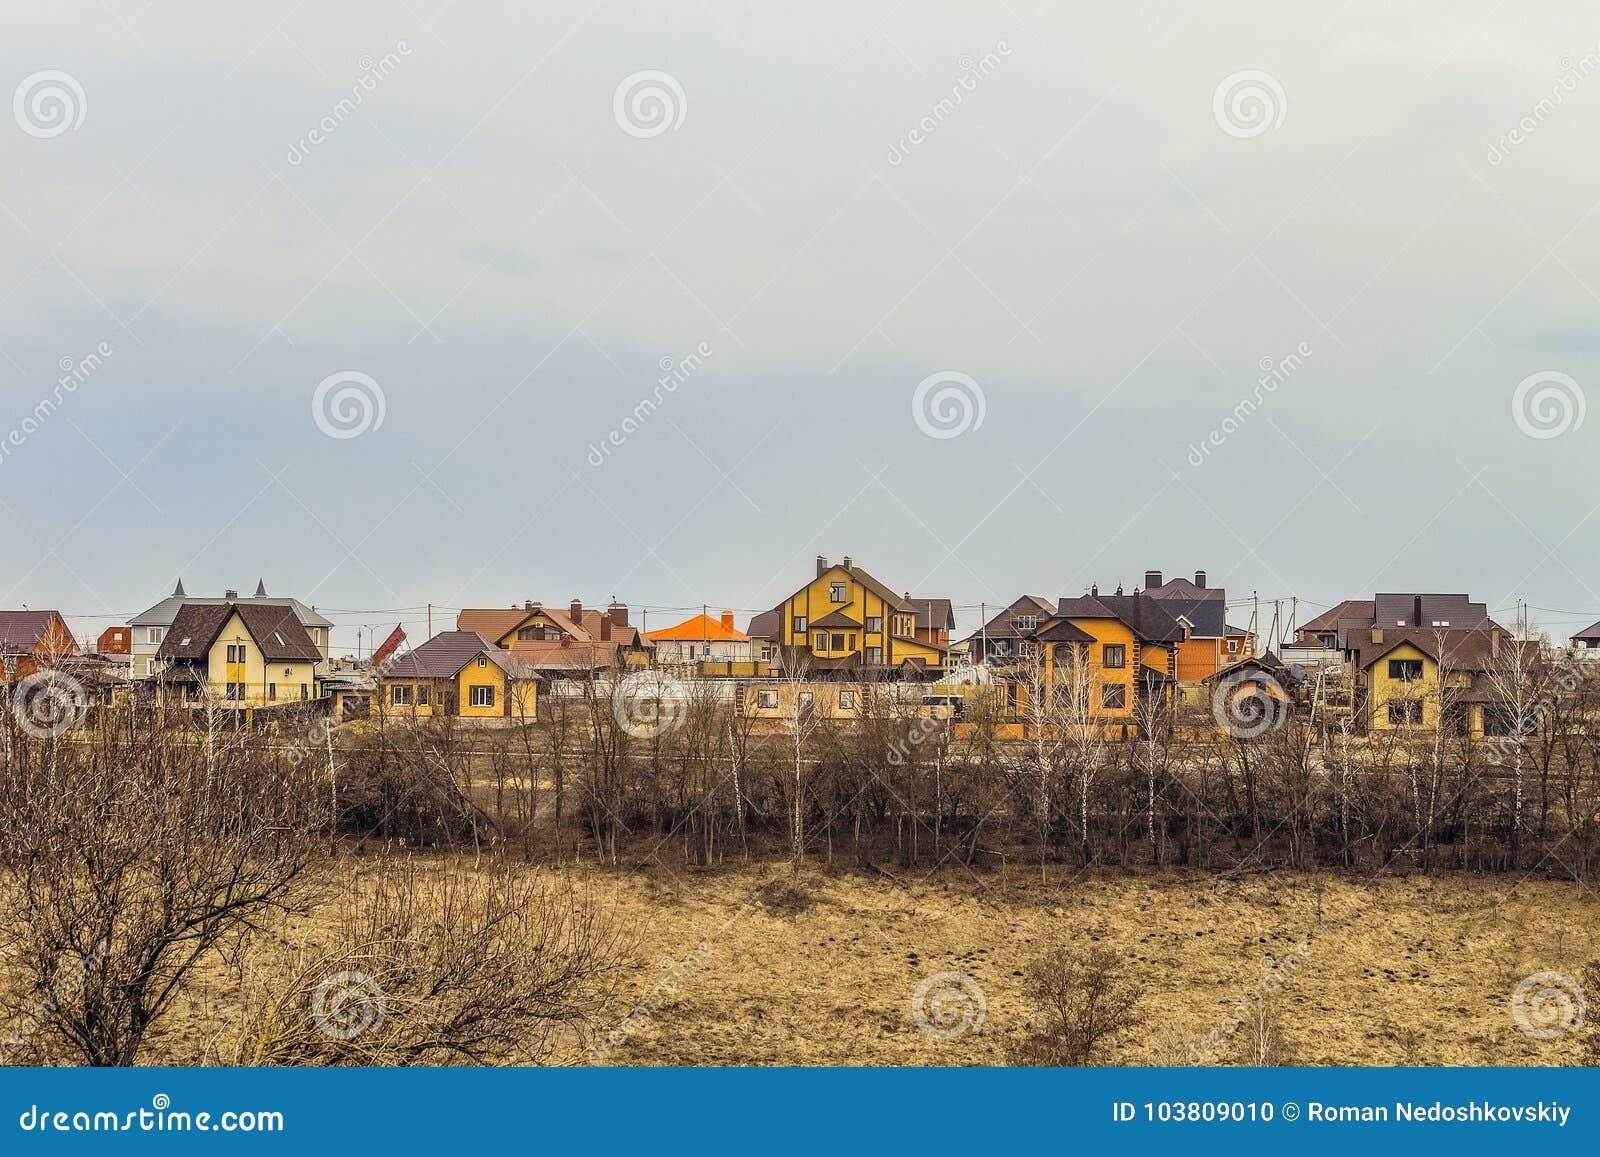 Buildings individual suburban housing in early spring. Belgorod Region, Russia.